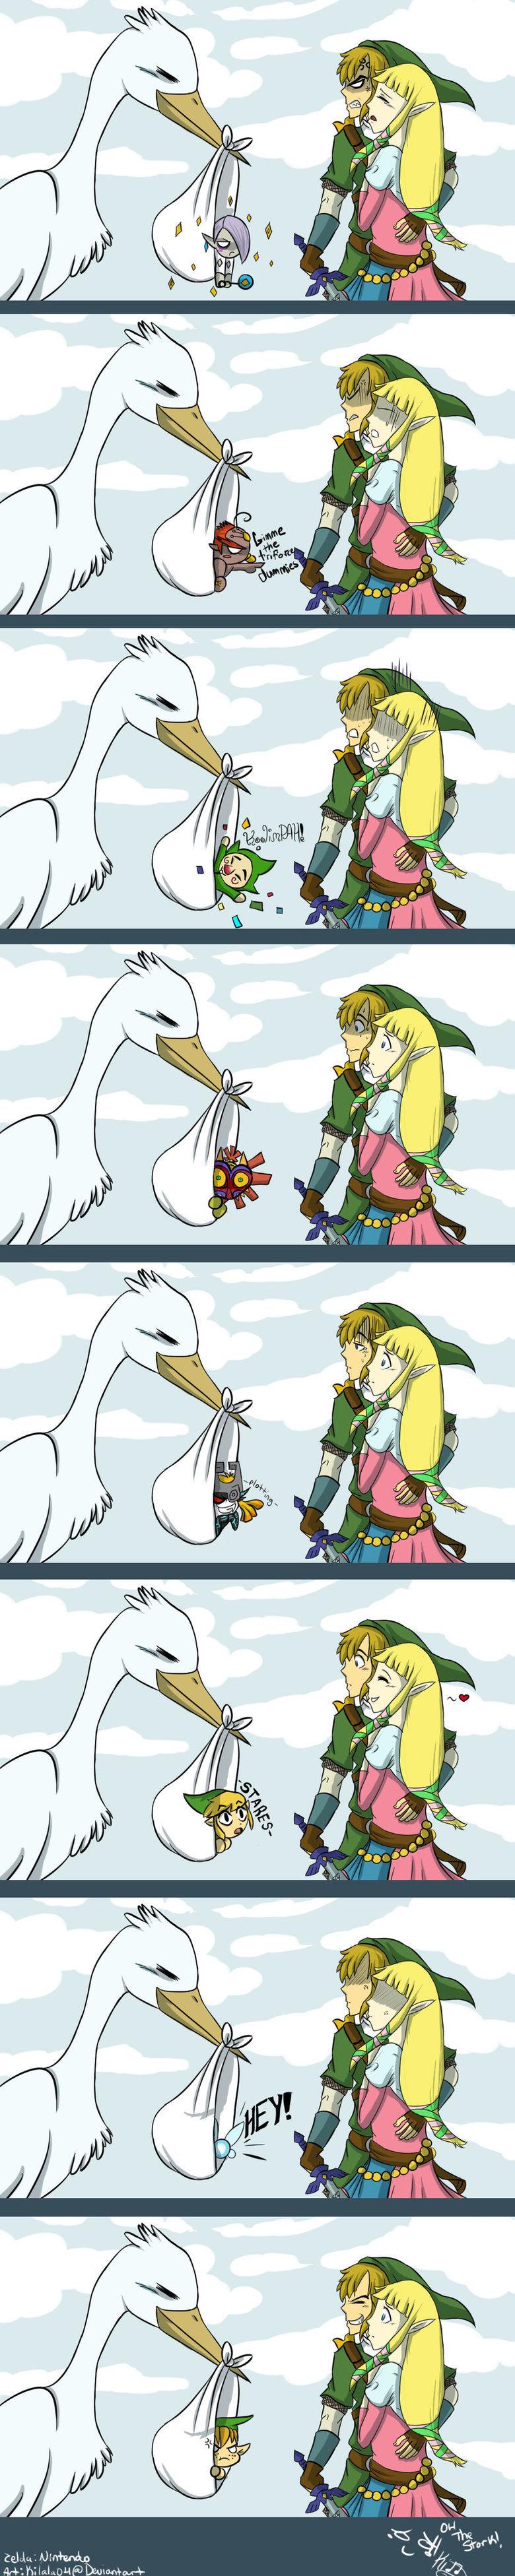 Link and Zelda. Found it on DeviantsArt.. Have fun